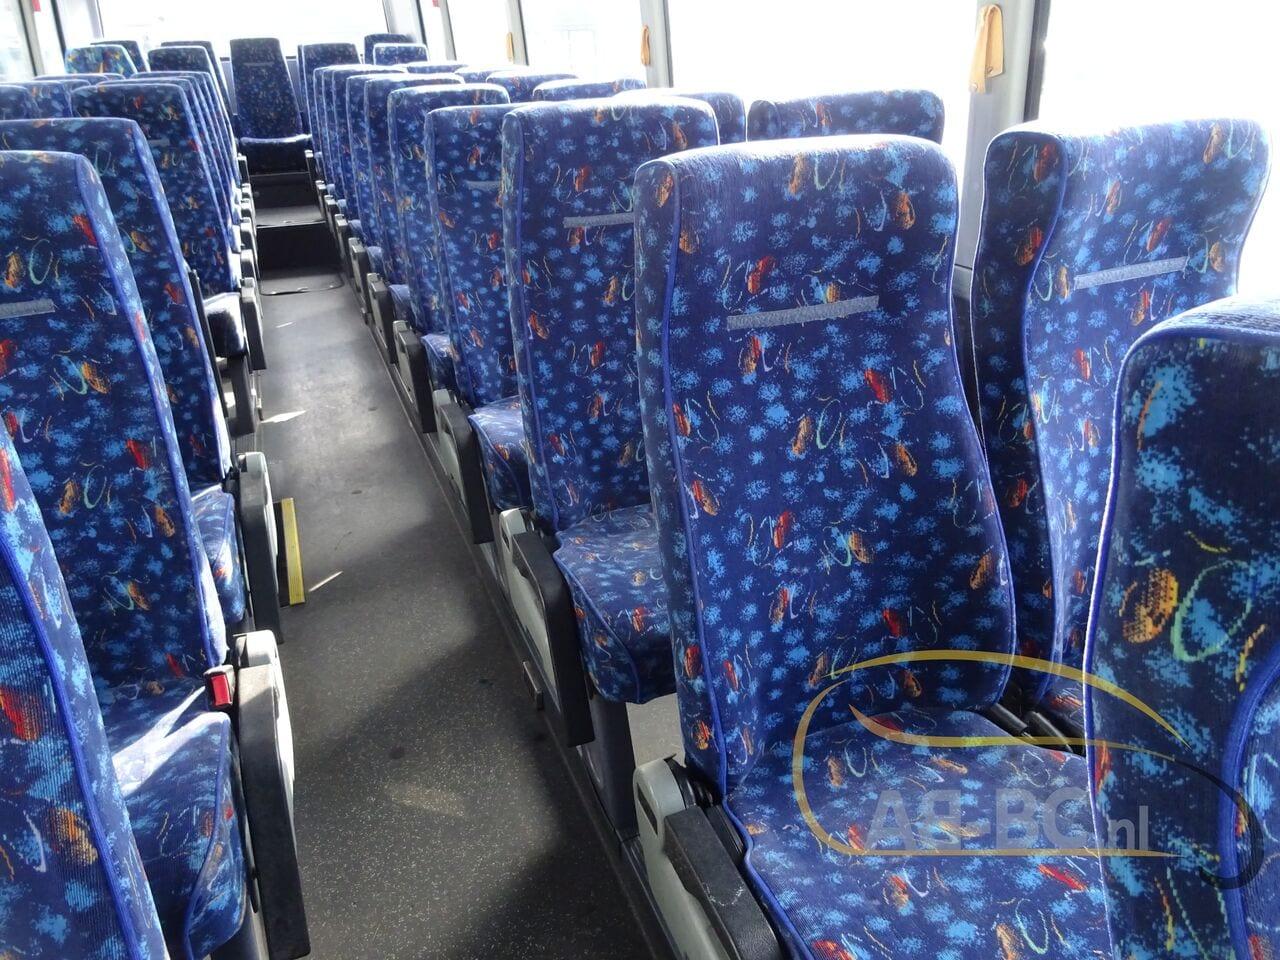 coach-busTEMSA-Safari-RD-65-Seats---1620311991837470565_big_85bb4ae3f3fa0b27614ae786f4afd743--21050617272795316700